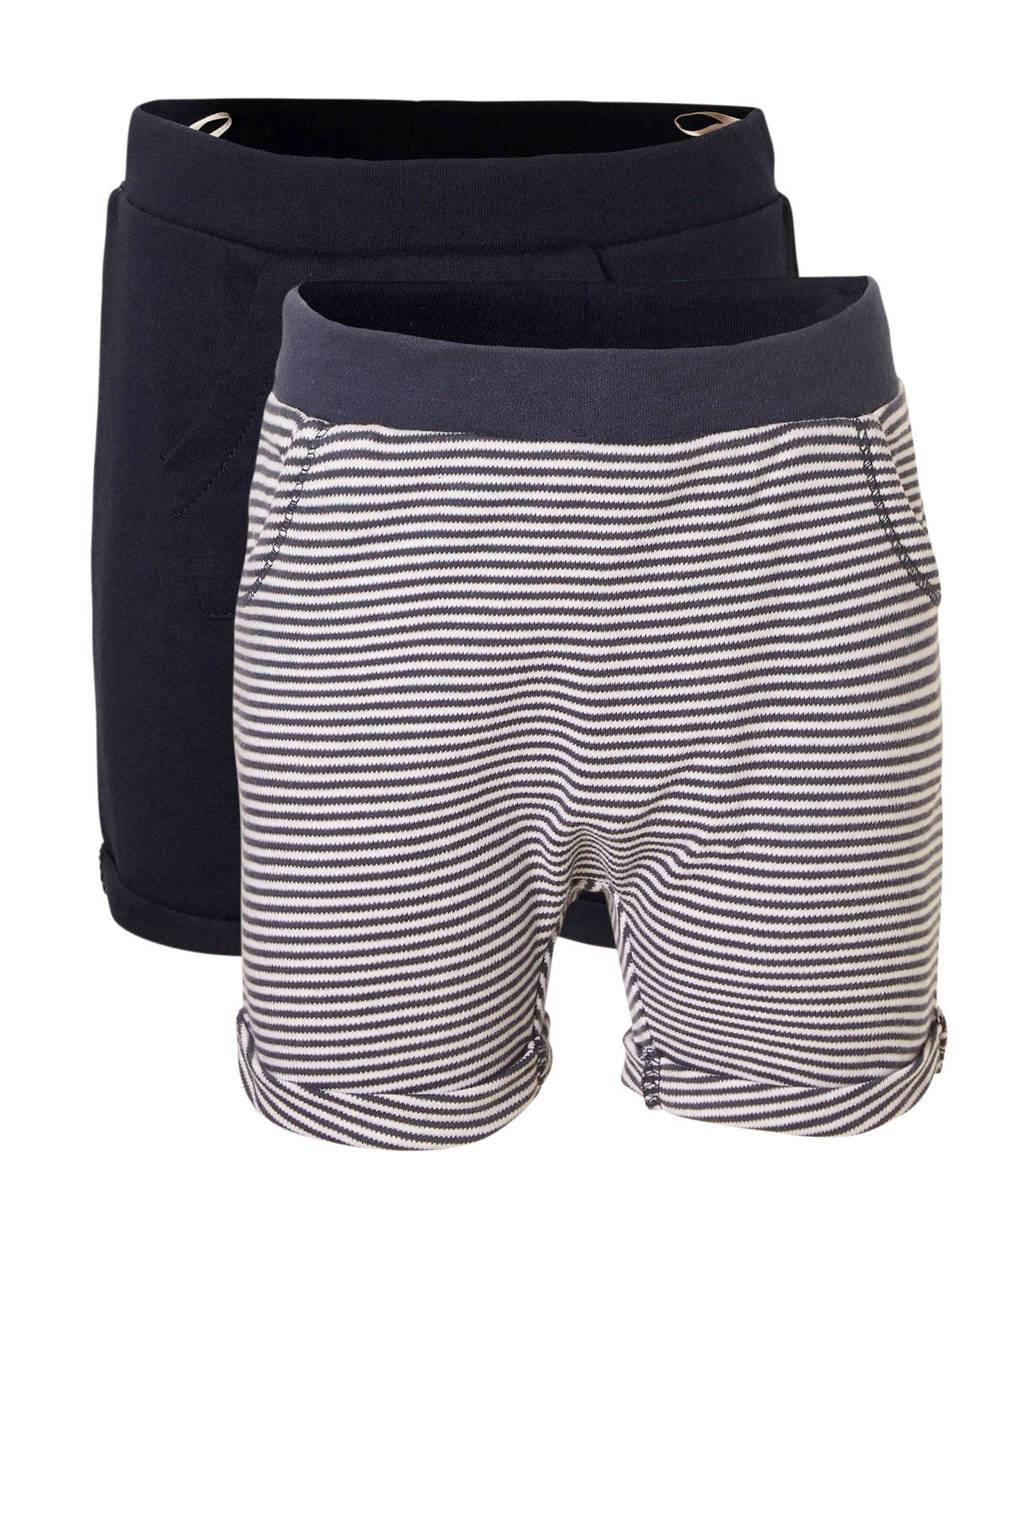 C&A Baby Club gestreepte sweatshort donkerblauw/wit, Donkerblauw/wit